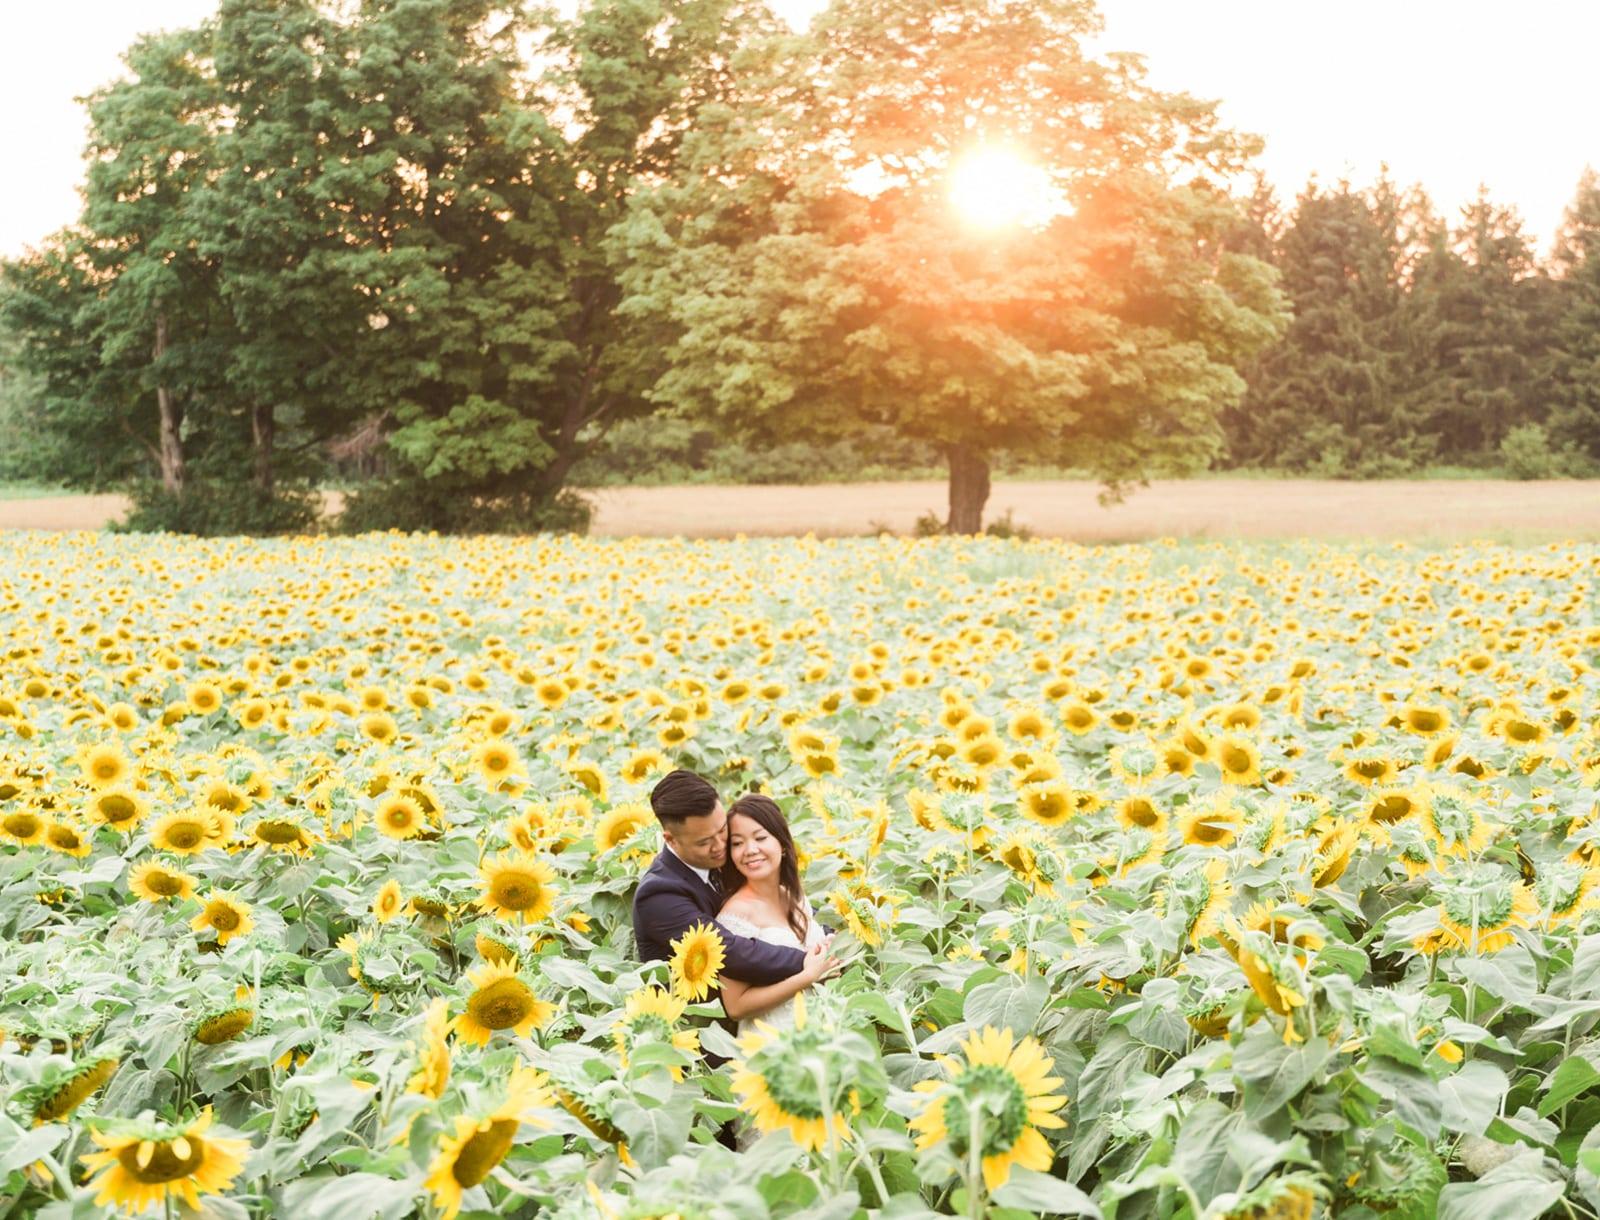 A Romantic Anniversary Session in Nature: Tiffany + Benny